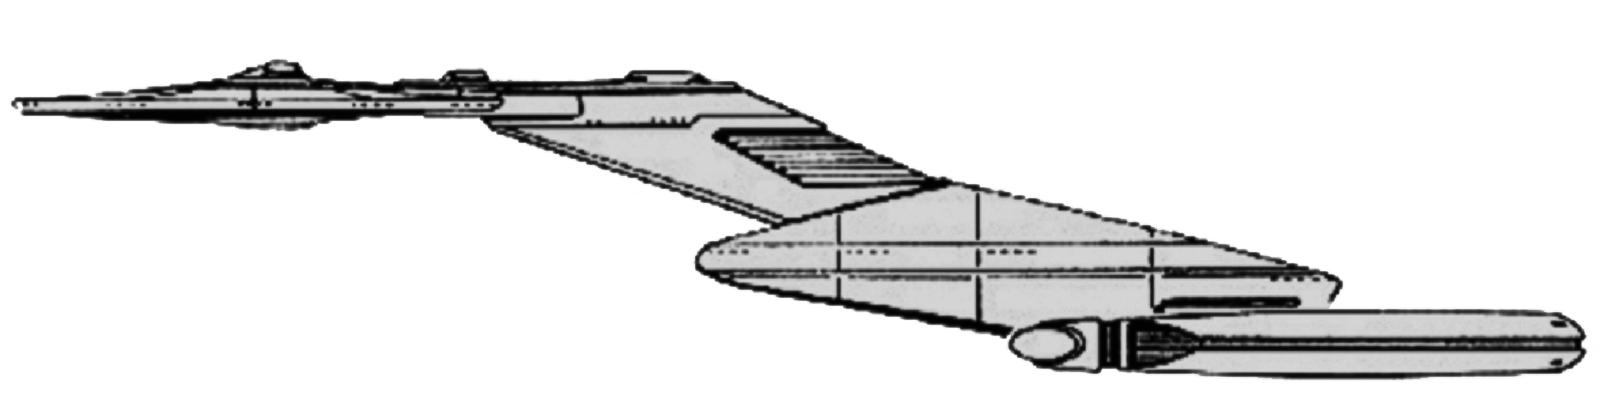 USS Adolphus (NCC-50010)